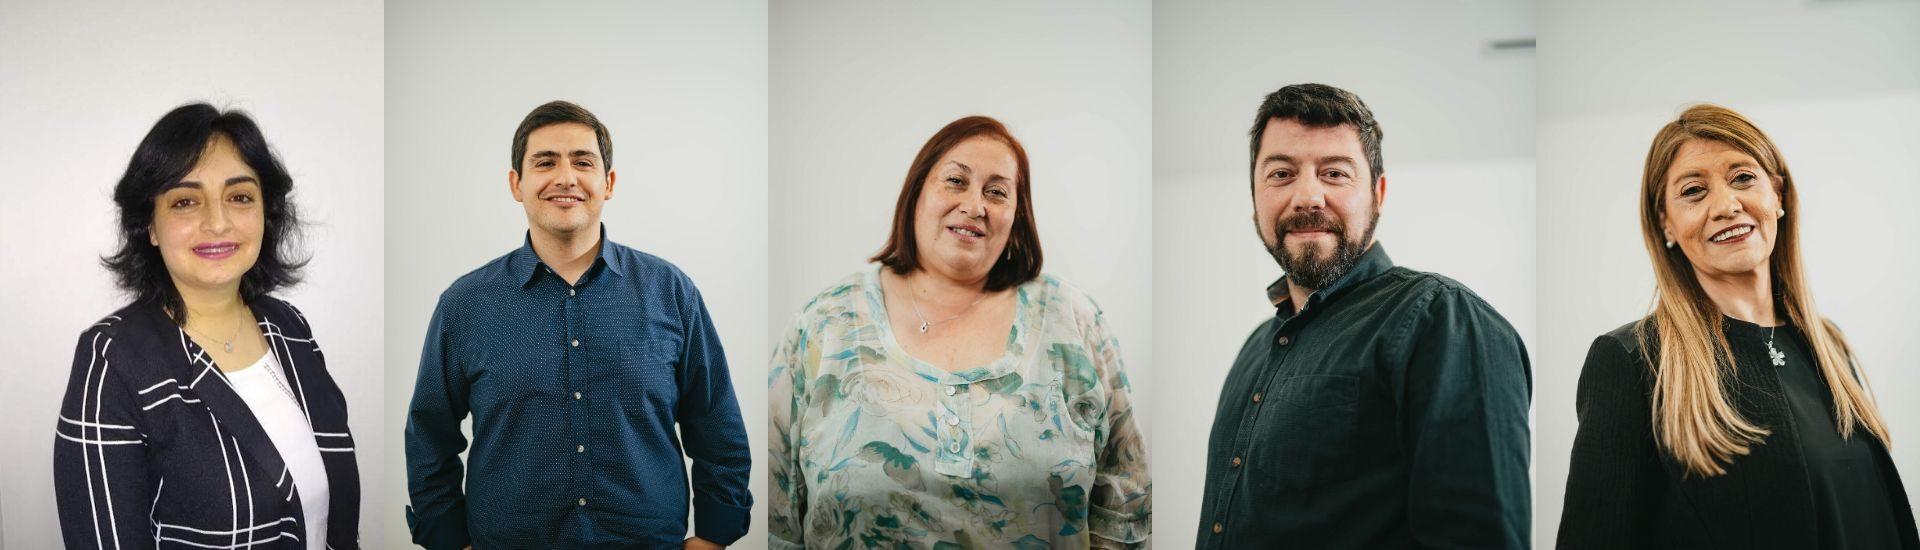 Finalistas del Global Teacher Prize Chile